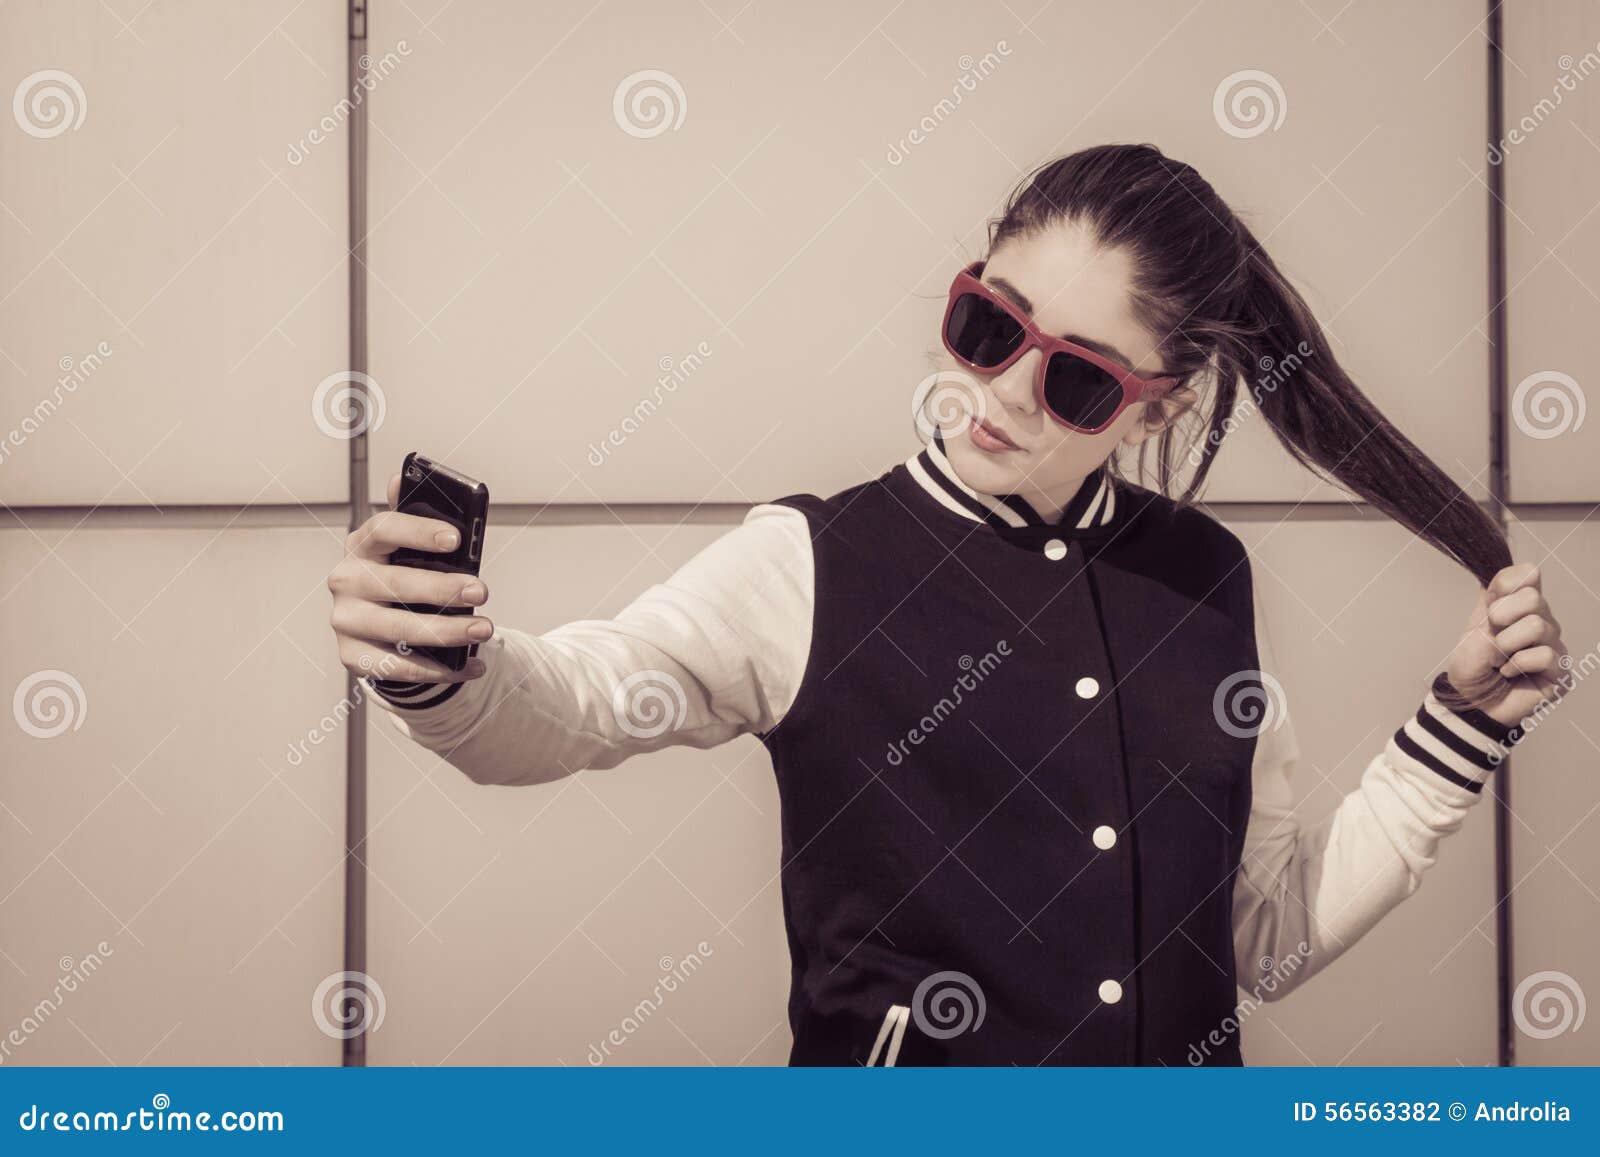 Download Μοντέρνο έφηβη στα κόκκινα γυαλιά ηλίου που παίρνουν την αυτοπροσωπογραφία Στοκ Εικόνες - εικόνα από ελεύθερος, ευτυχής: 56563382